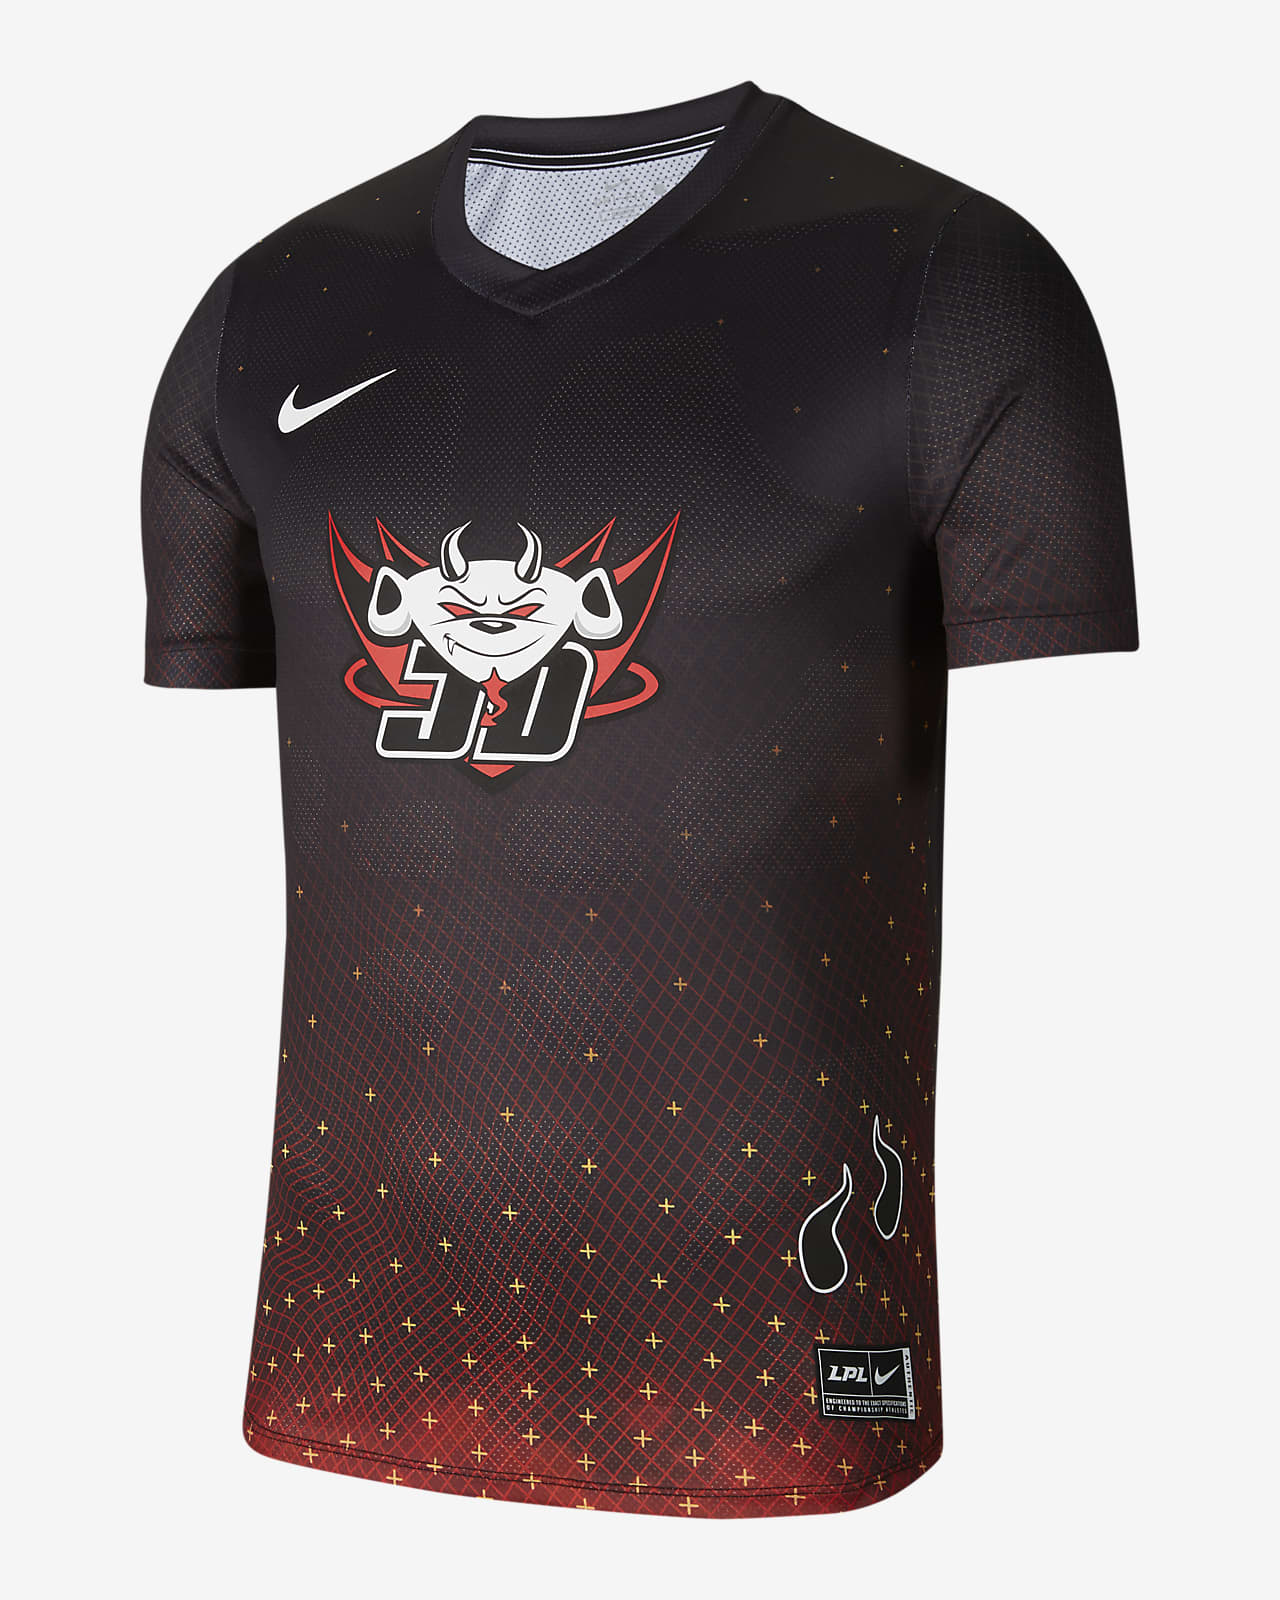 Nike x LPL JDG 男子球衣